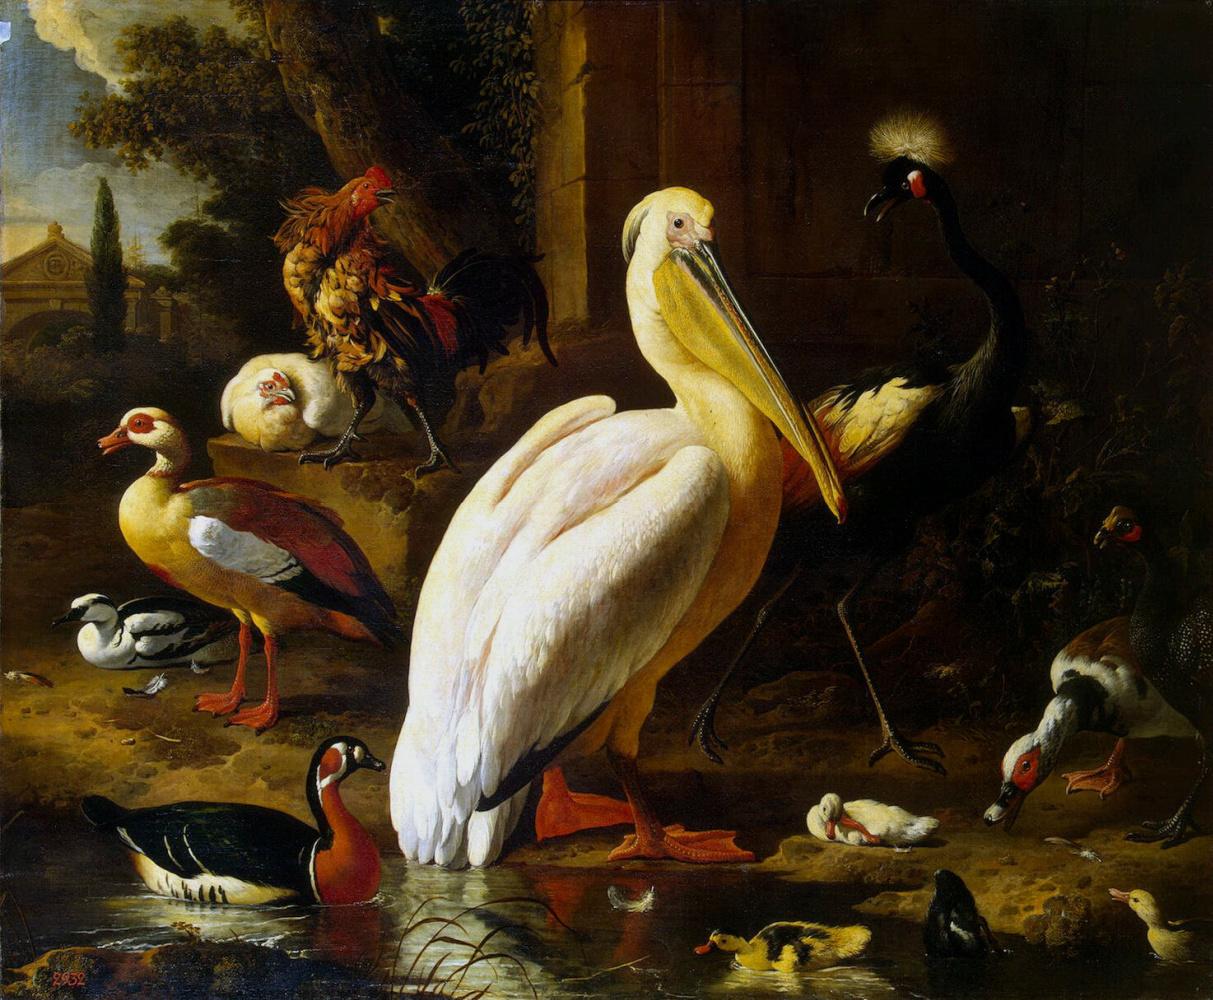 Melchior de Hondecuiter. Birds in the Park